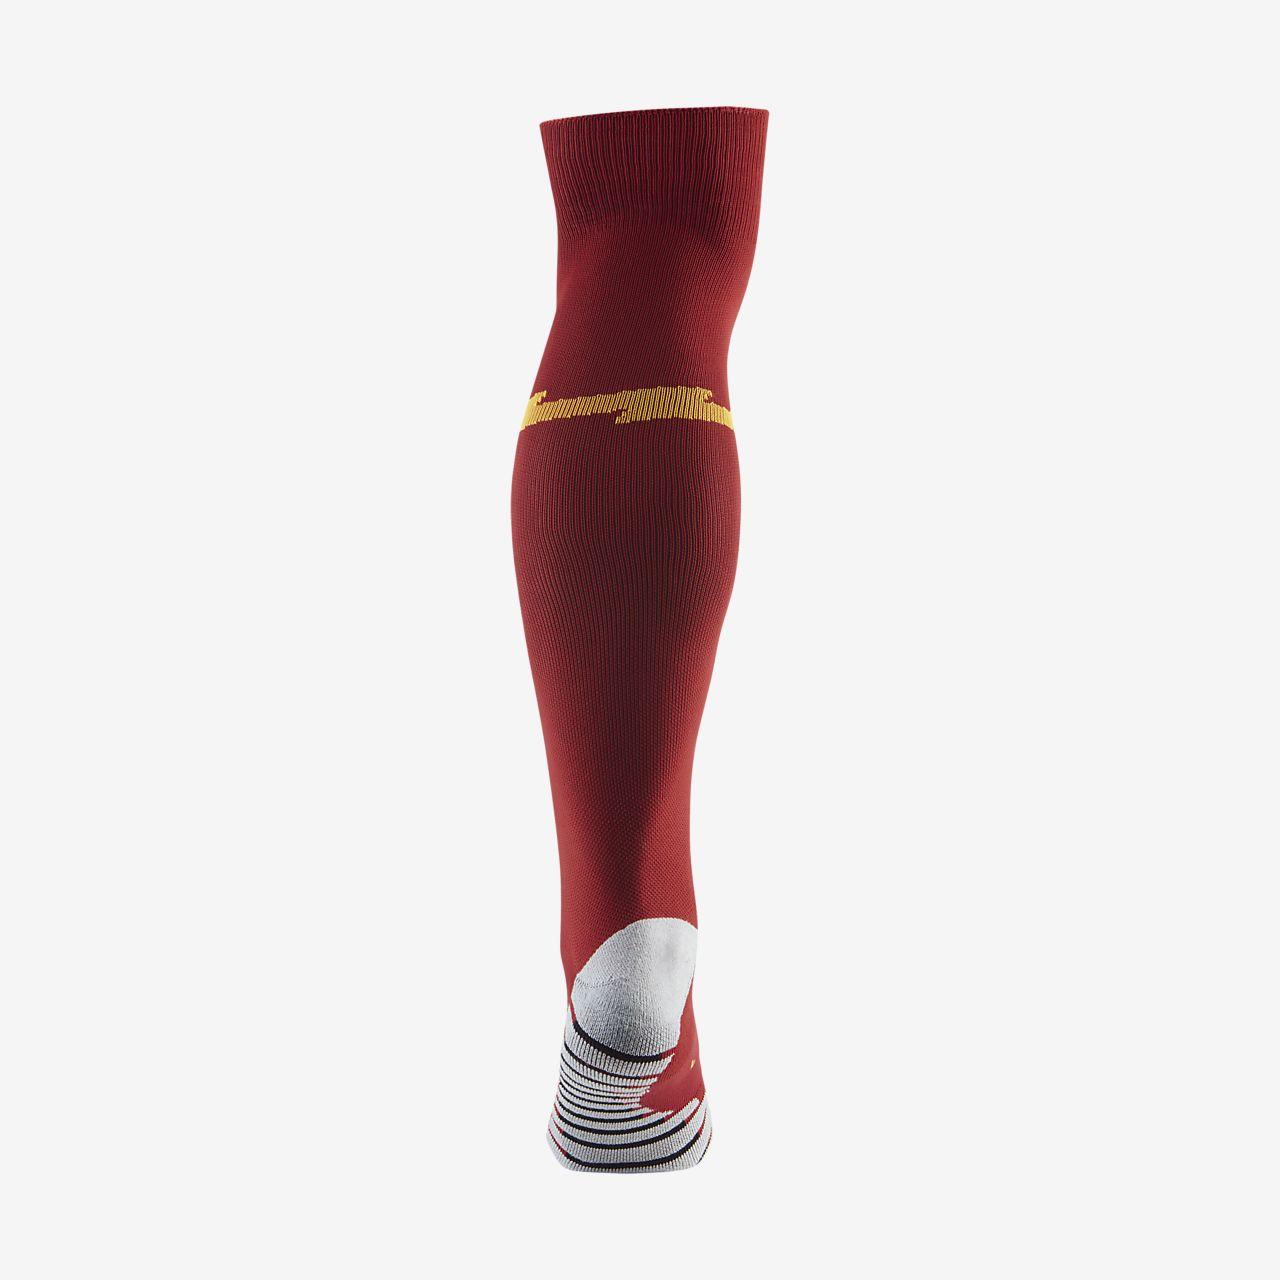 acbc9671a3b A.S. Roma 2019 Stadium Home Away Over-the-Calf Football Socks. Nike ...